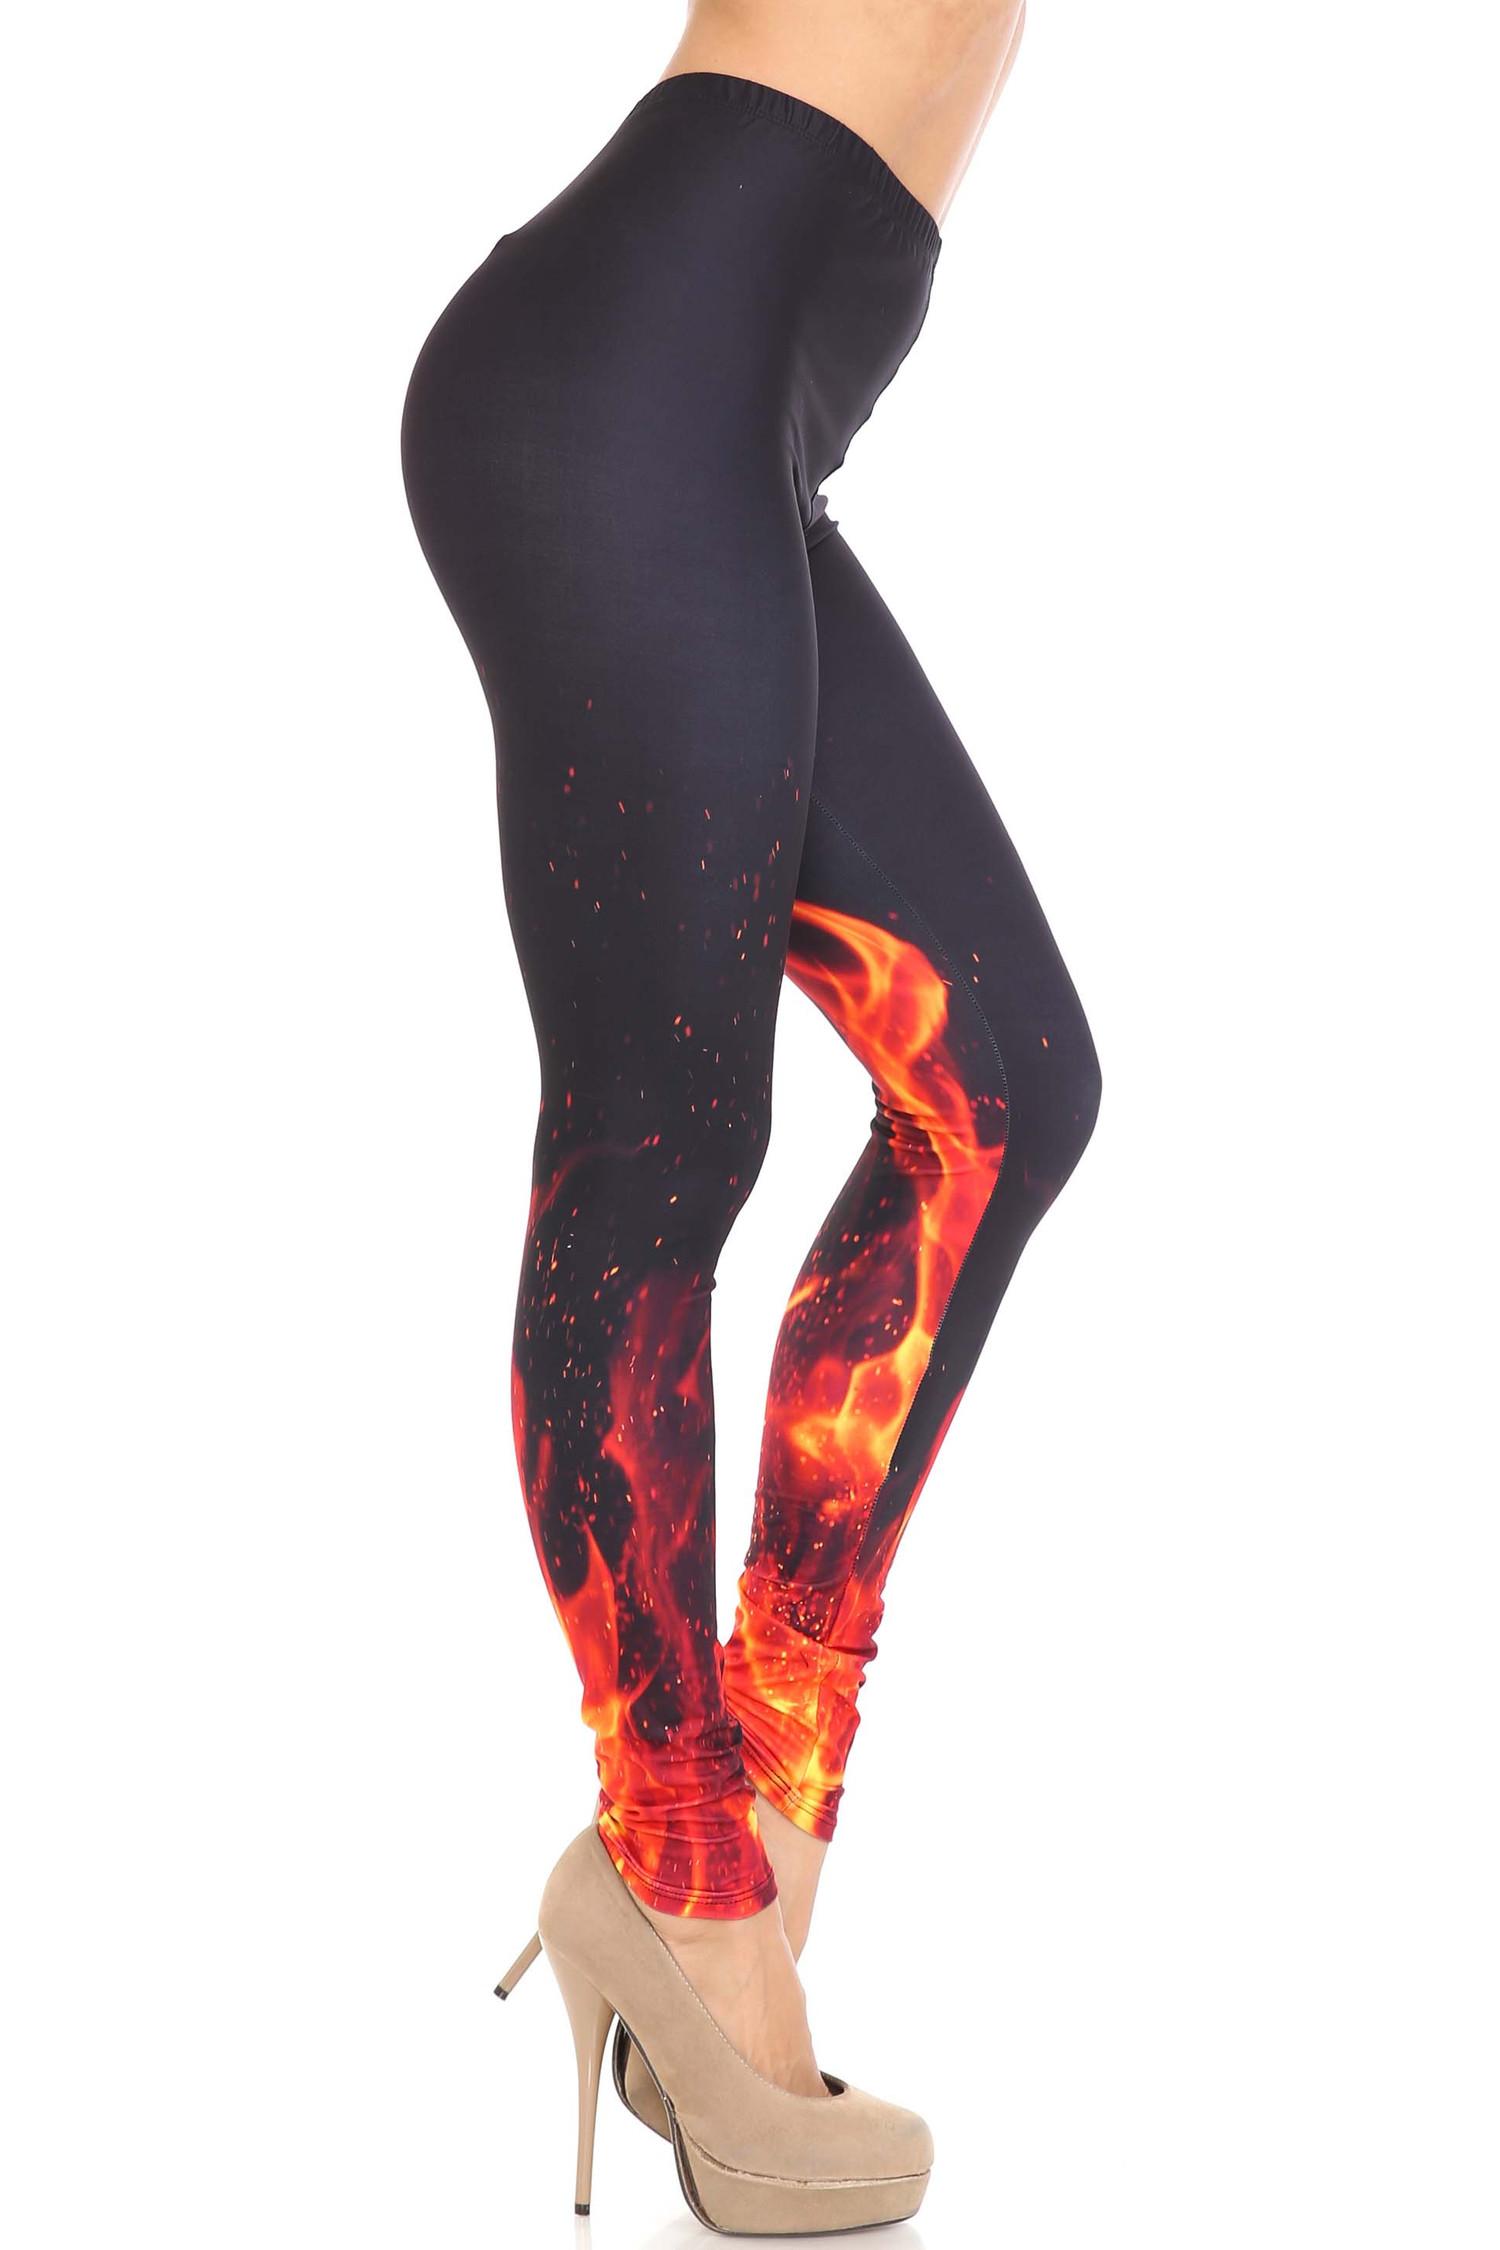 Creamy Soft Flame and Fire Leggings - USA Fashion™